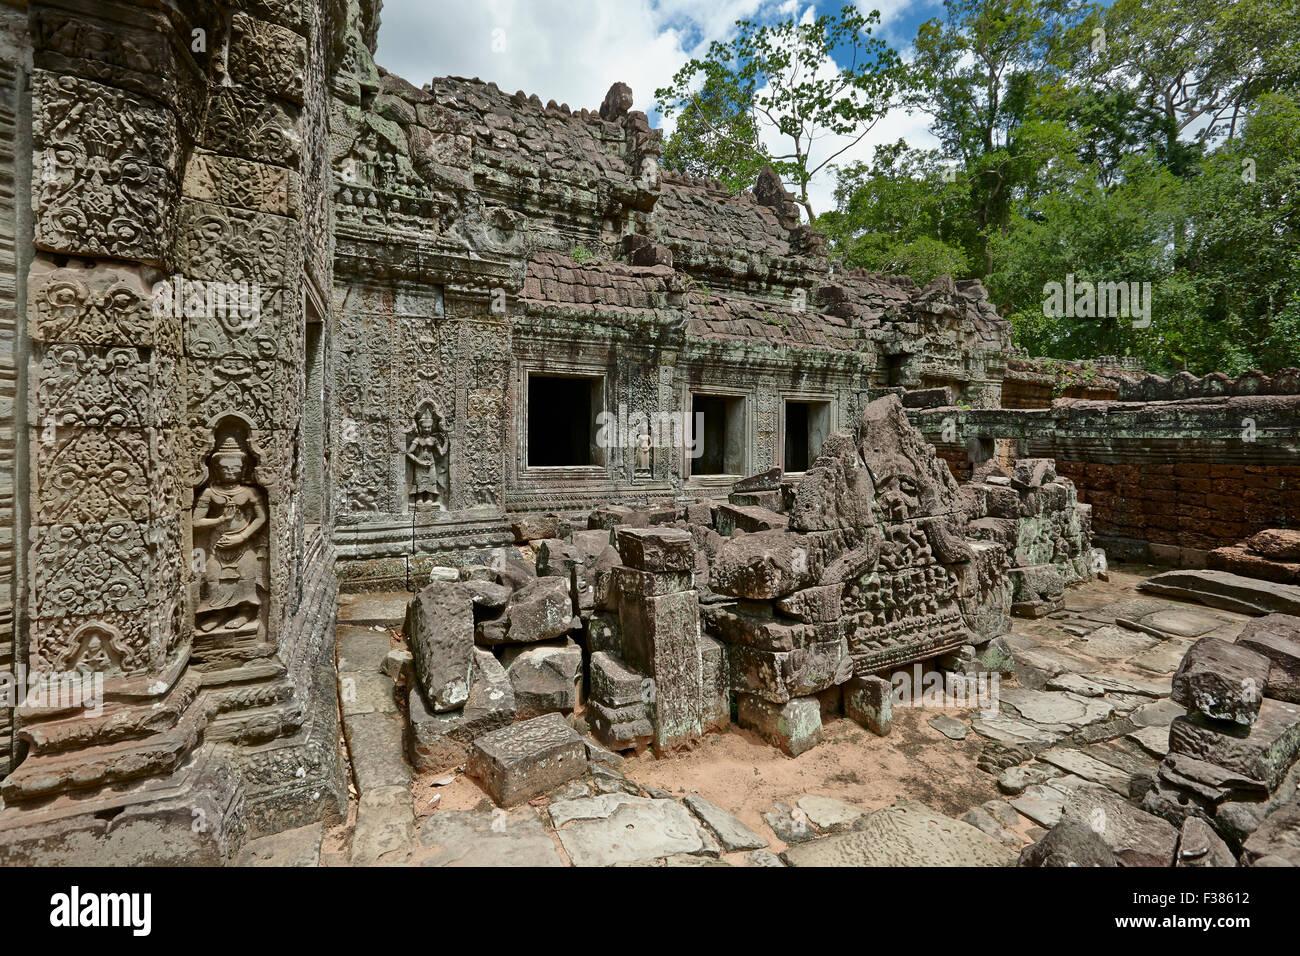 Preah Khan temple. Parco Archeologico di Angkor, Siem Reap Provincia, in Cambogia. Immagini Stock